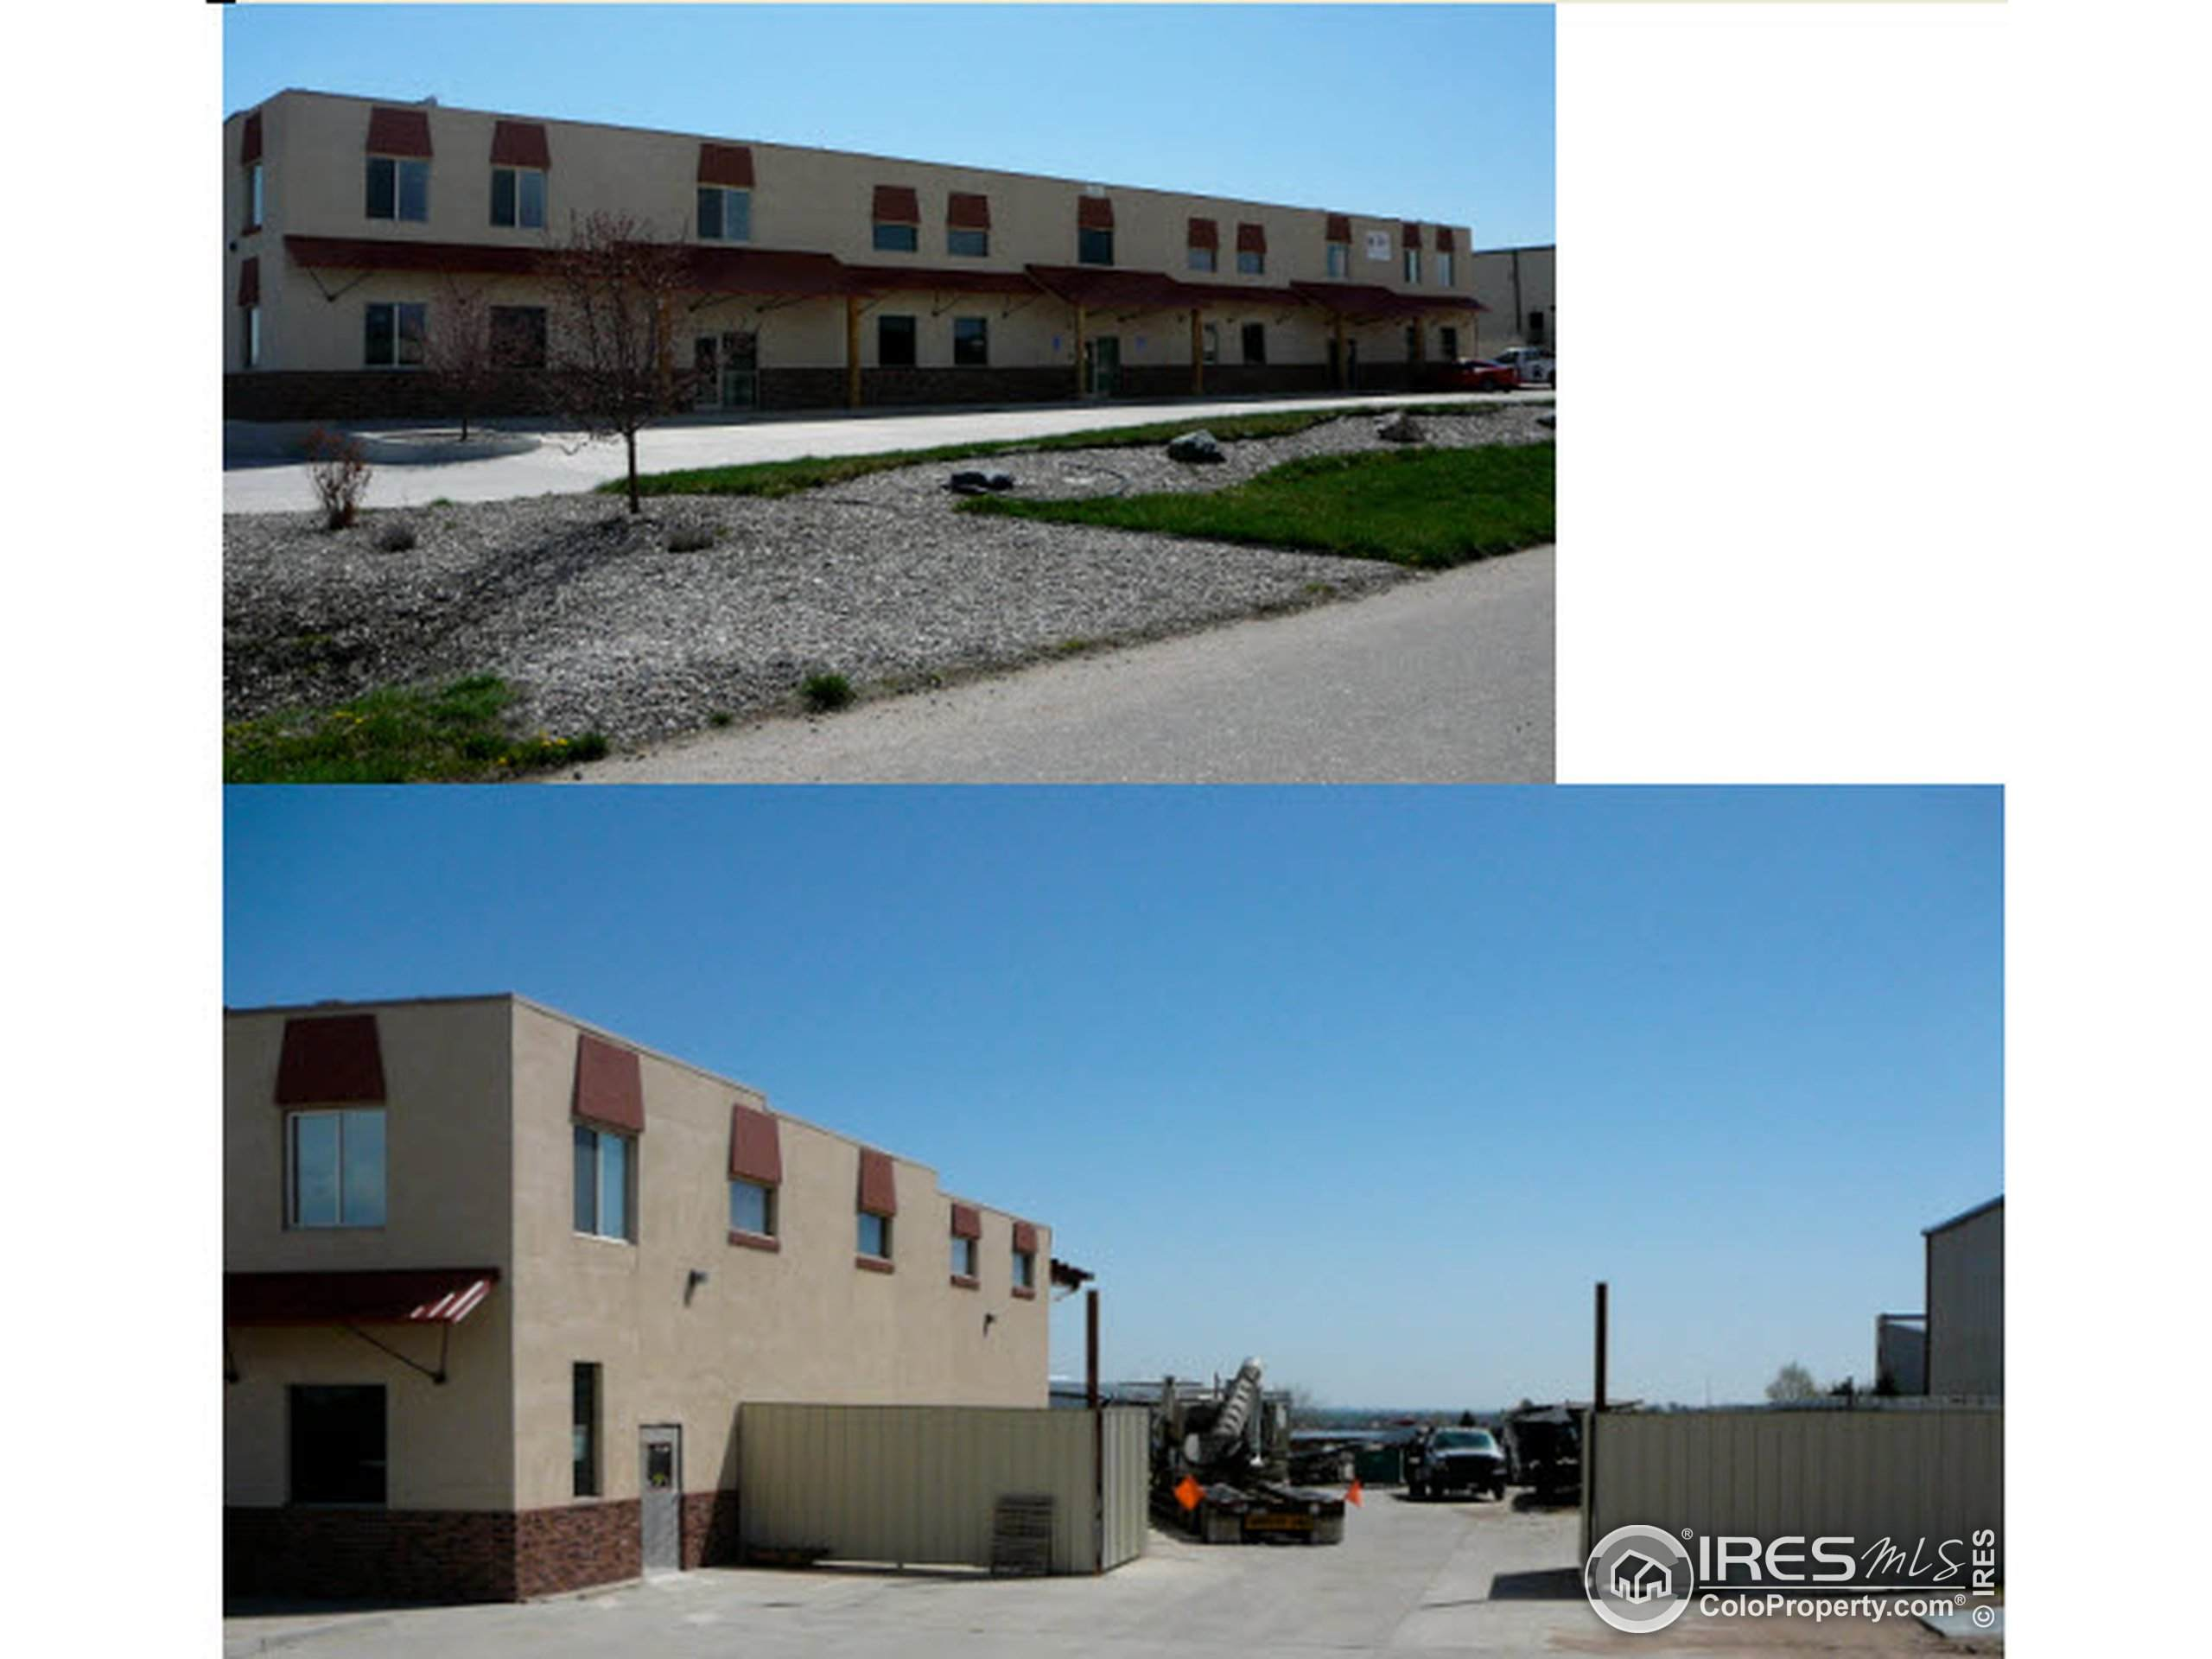 67 Quail Rd, Longmont, CO 80501 (MLS #940428) :: RE/MAX Alliance